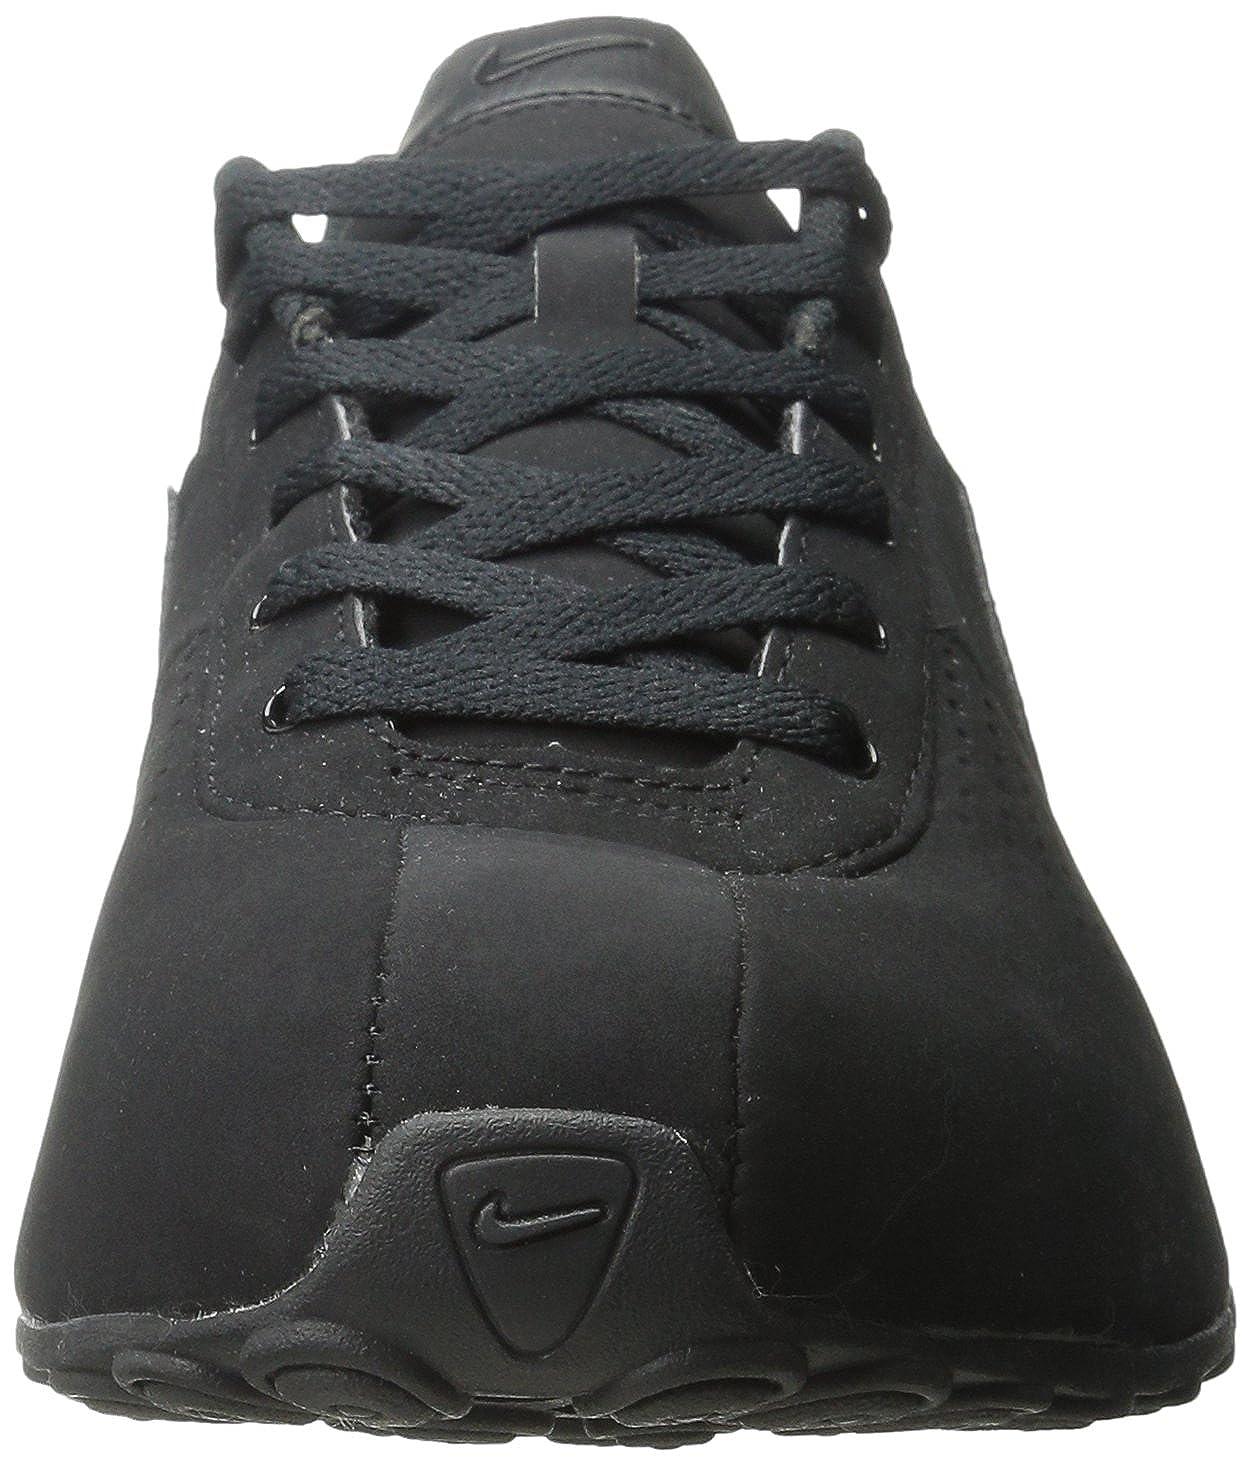 Nike Shox Deliver Zapatillas de Running para Hombre, Negro